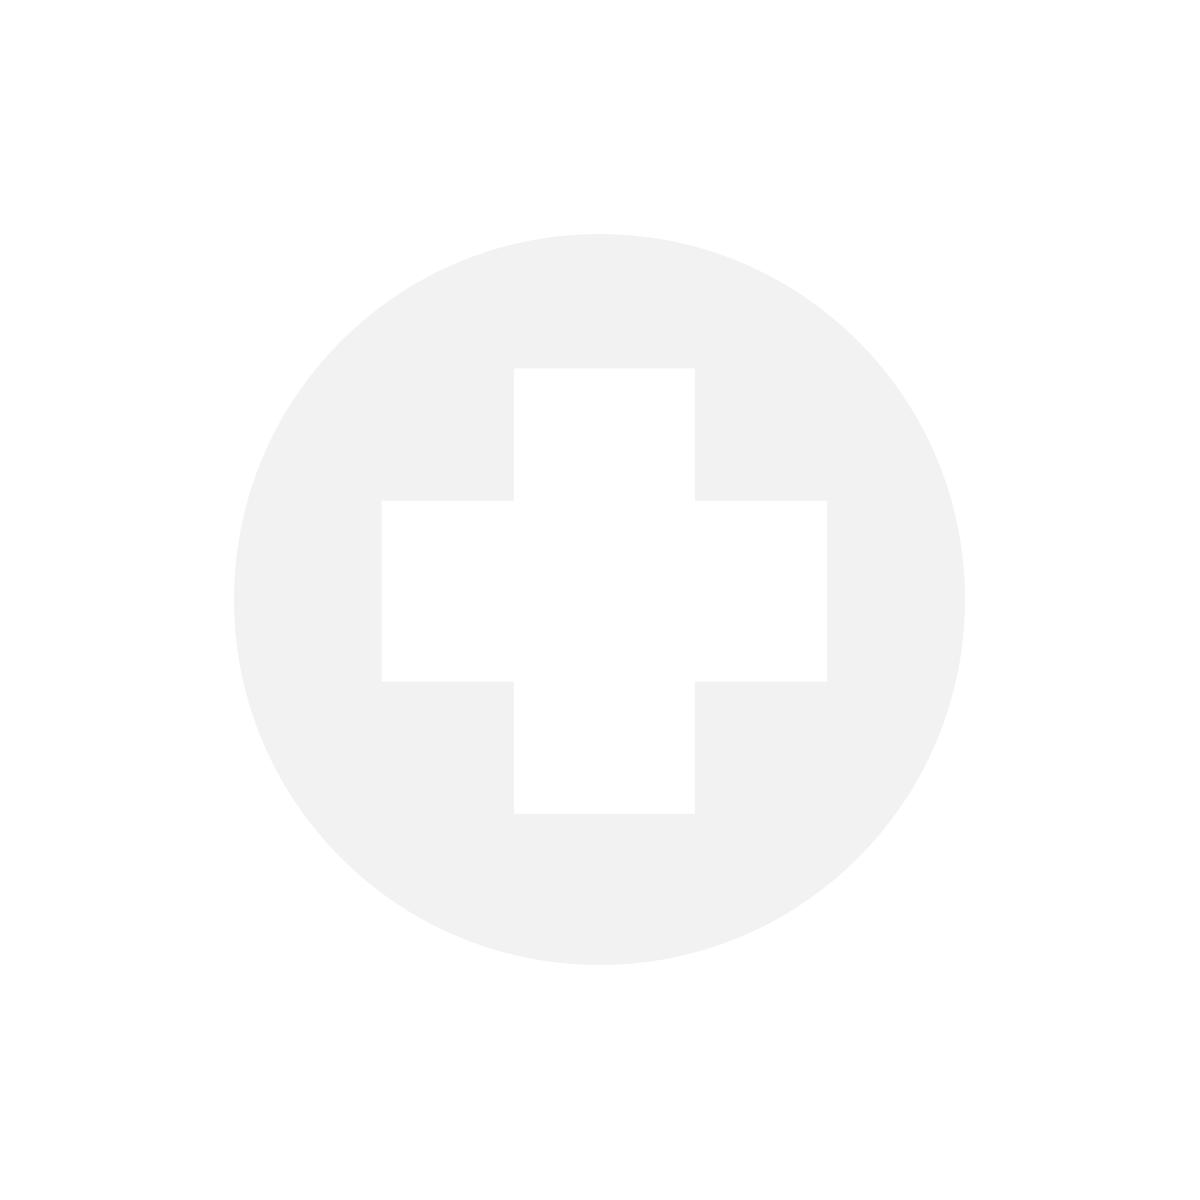 Sonde vaginale Periform®+